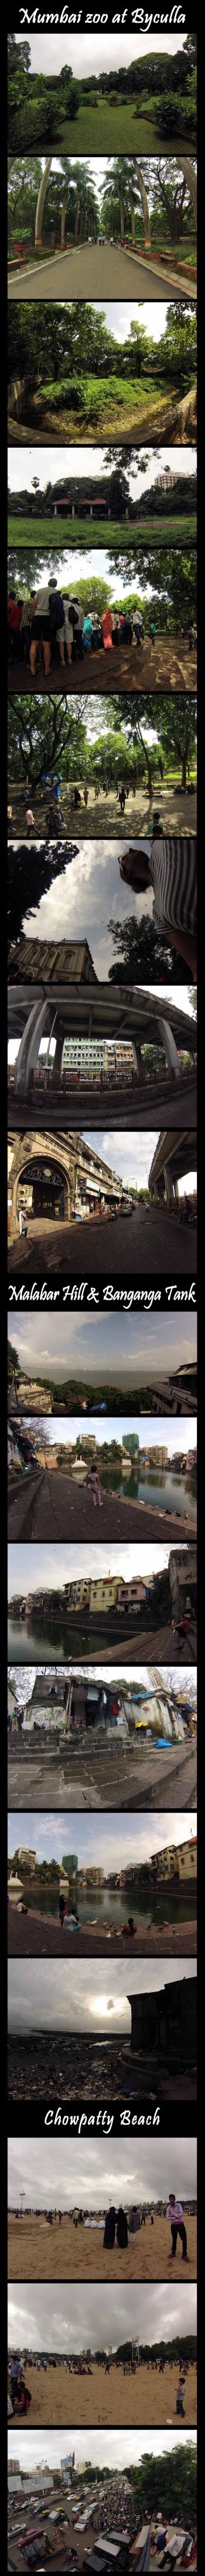 india,mumbai,eid,people,crowd,muslims,big bazaar,zoo,byculla,malabar hill,banganga tank